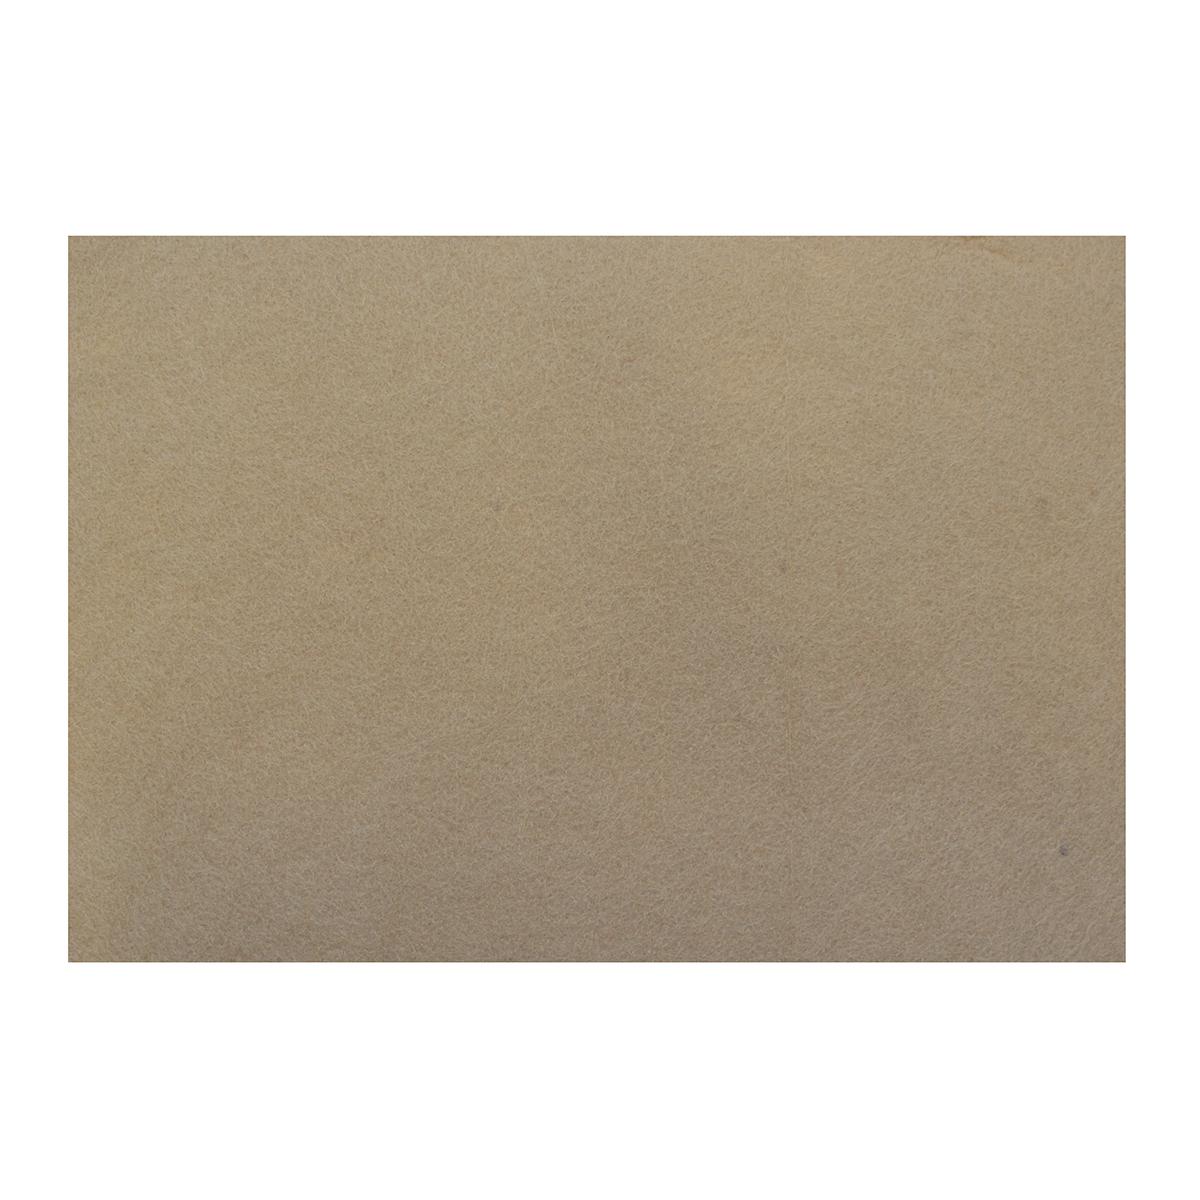 Фетр листовой Астра, цвет: бежевый, 20 х 30 см, 10 шт7708618_YF 641 бежевый